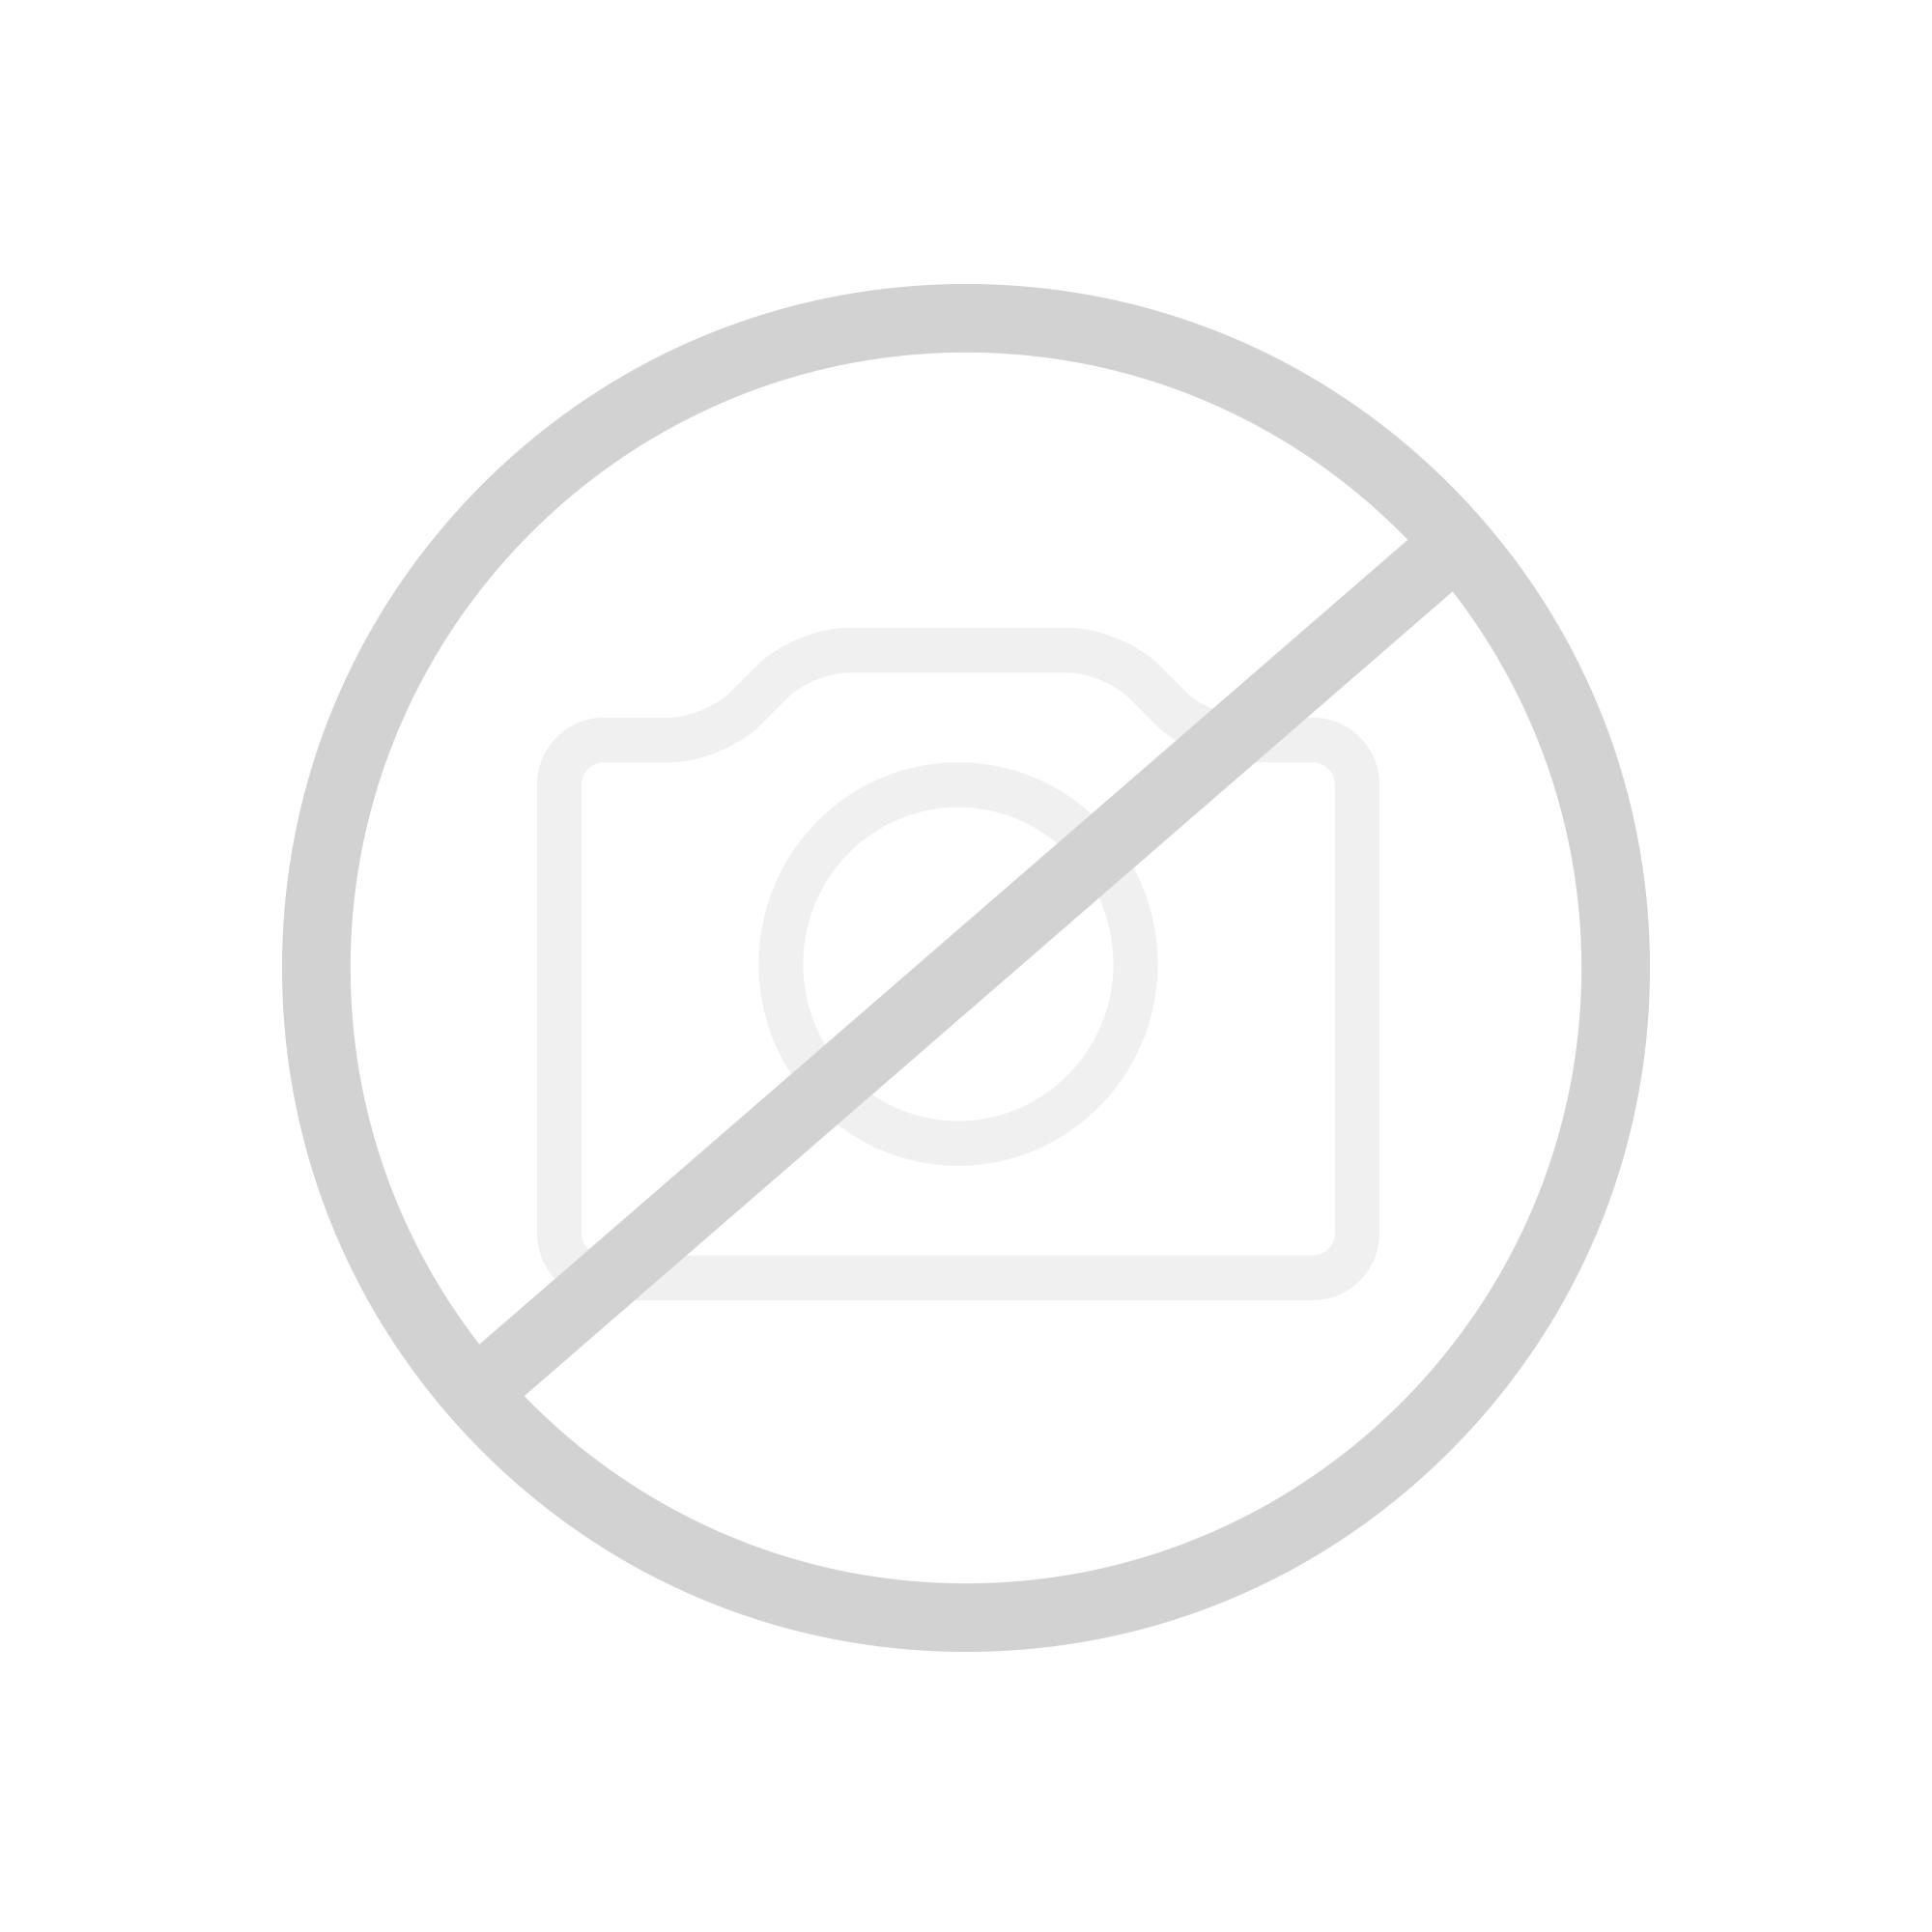 Reinhard arosa Sideboard